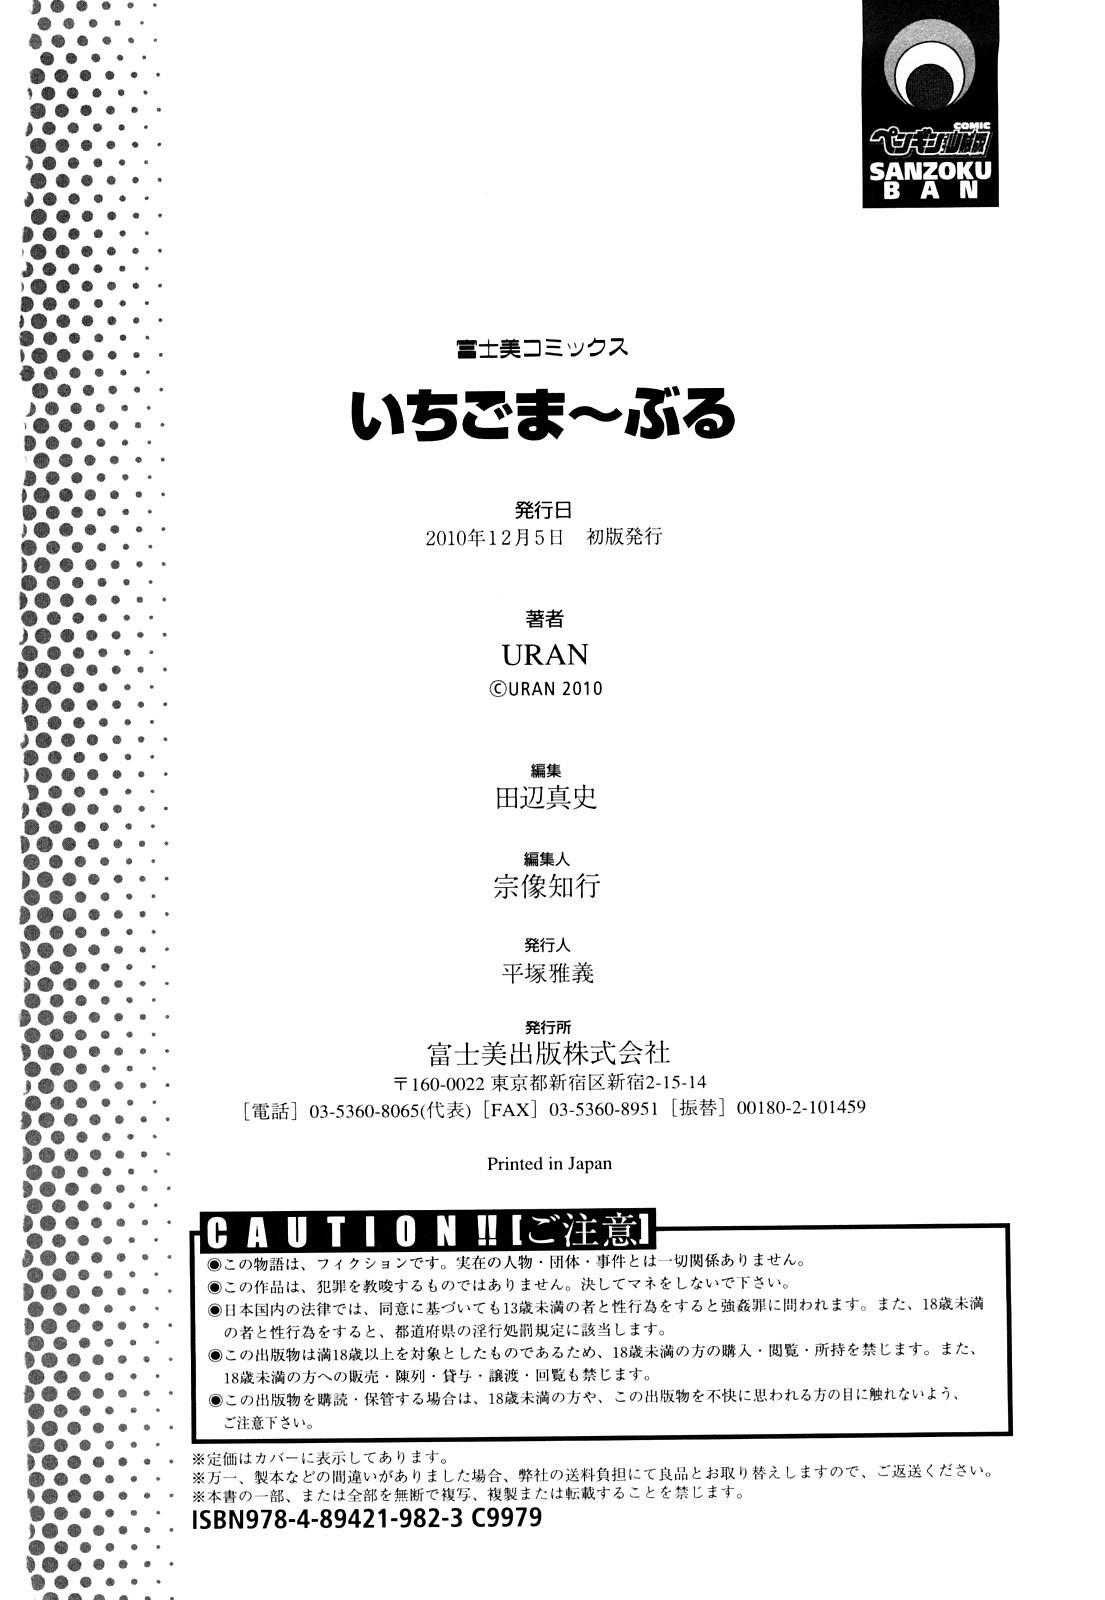 Ichigo Marble 196